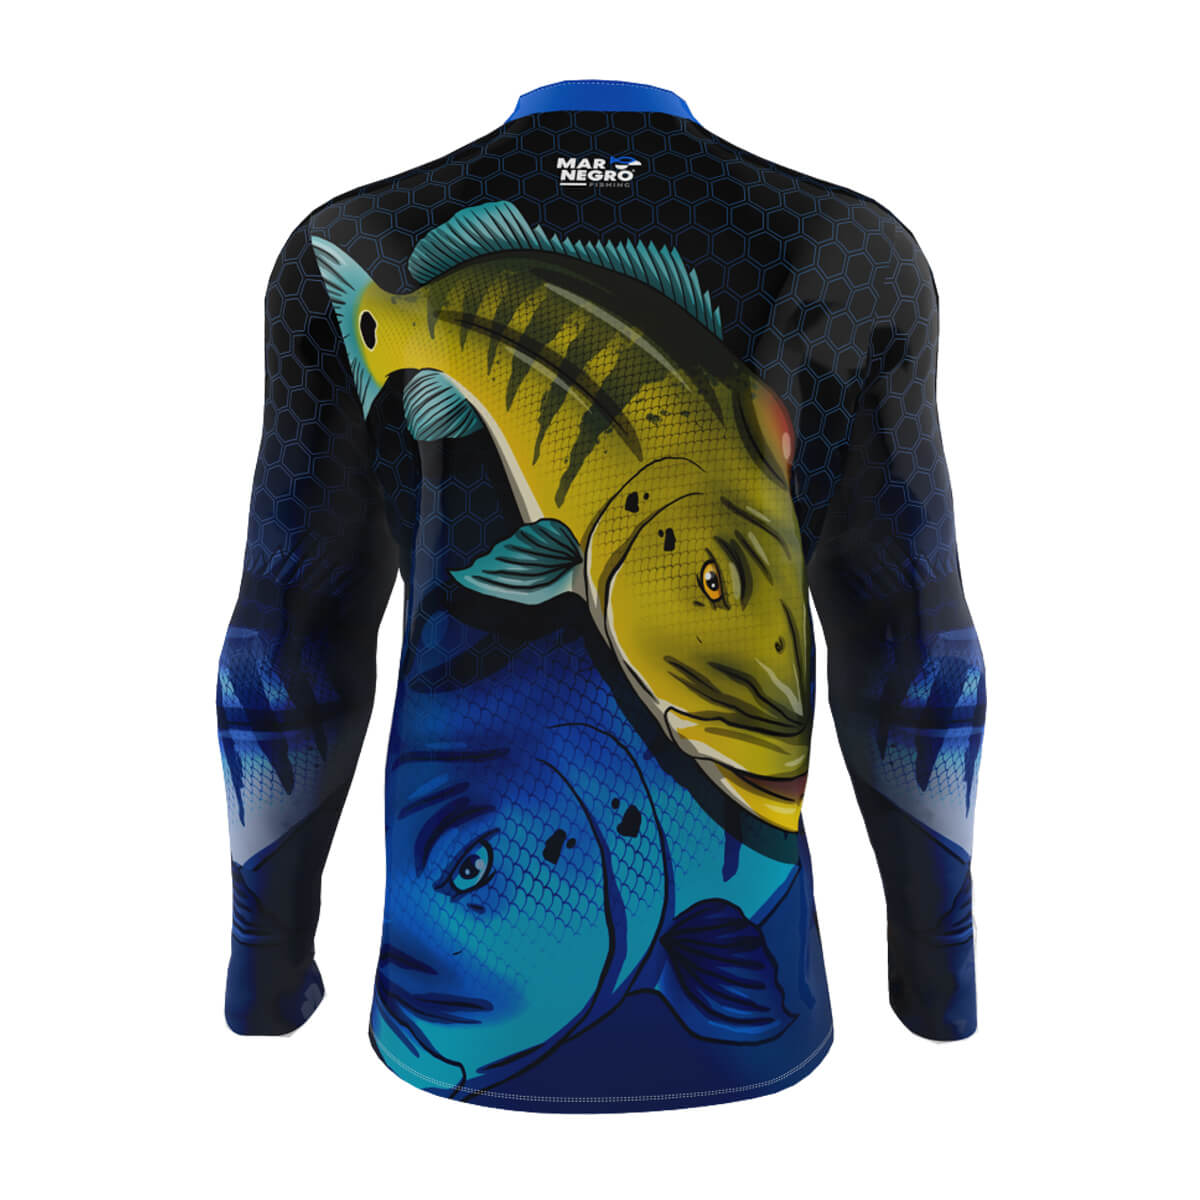 Camiseta Mar Negro Infantil 2021 Tucunaré Azul 01  - Pró Pesca Shop